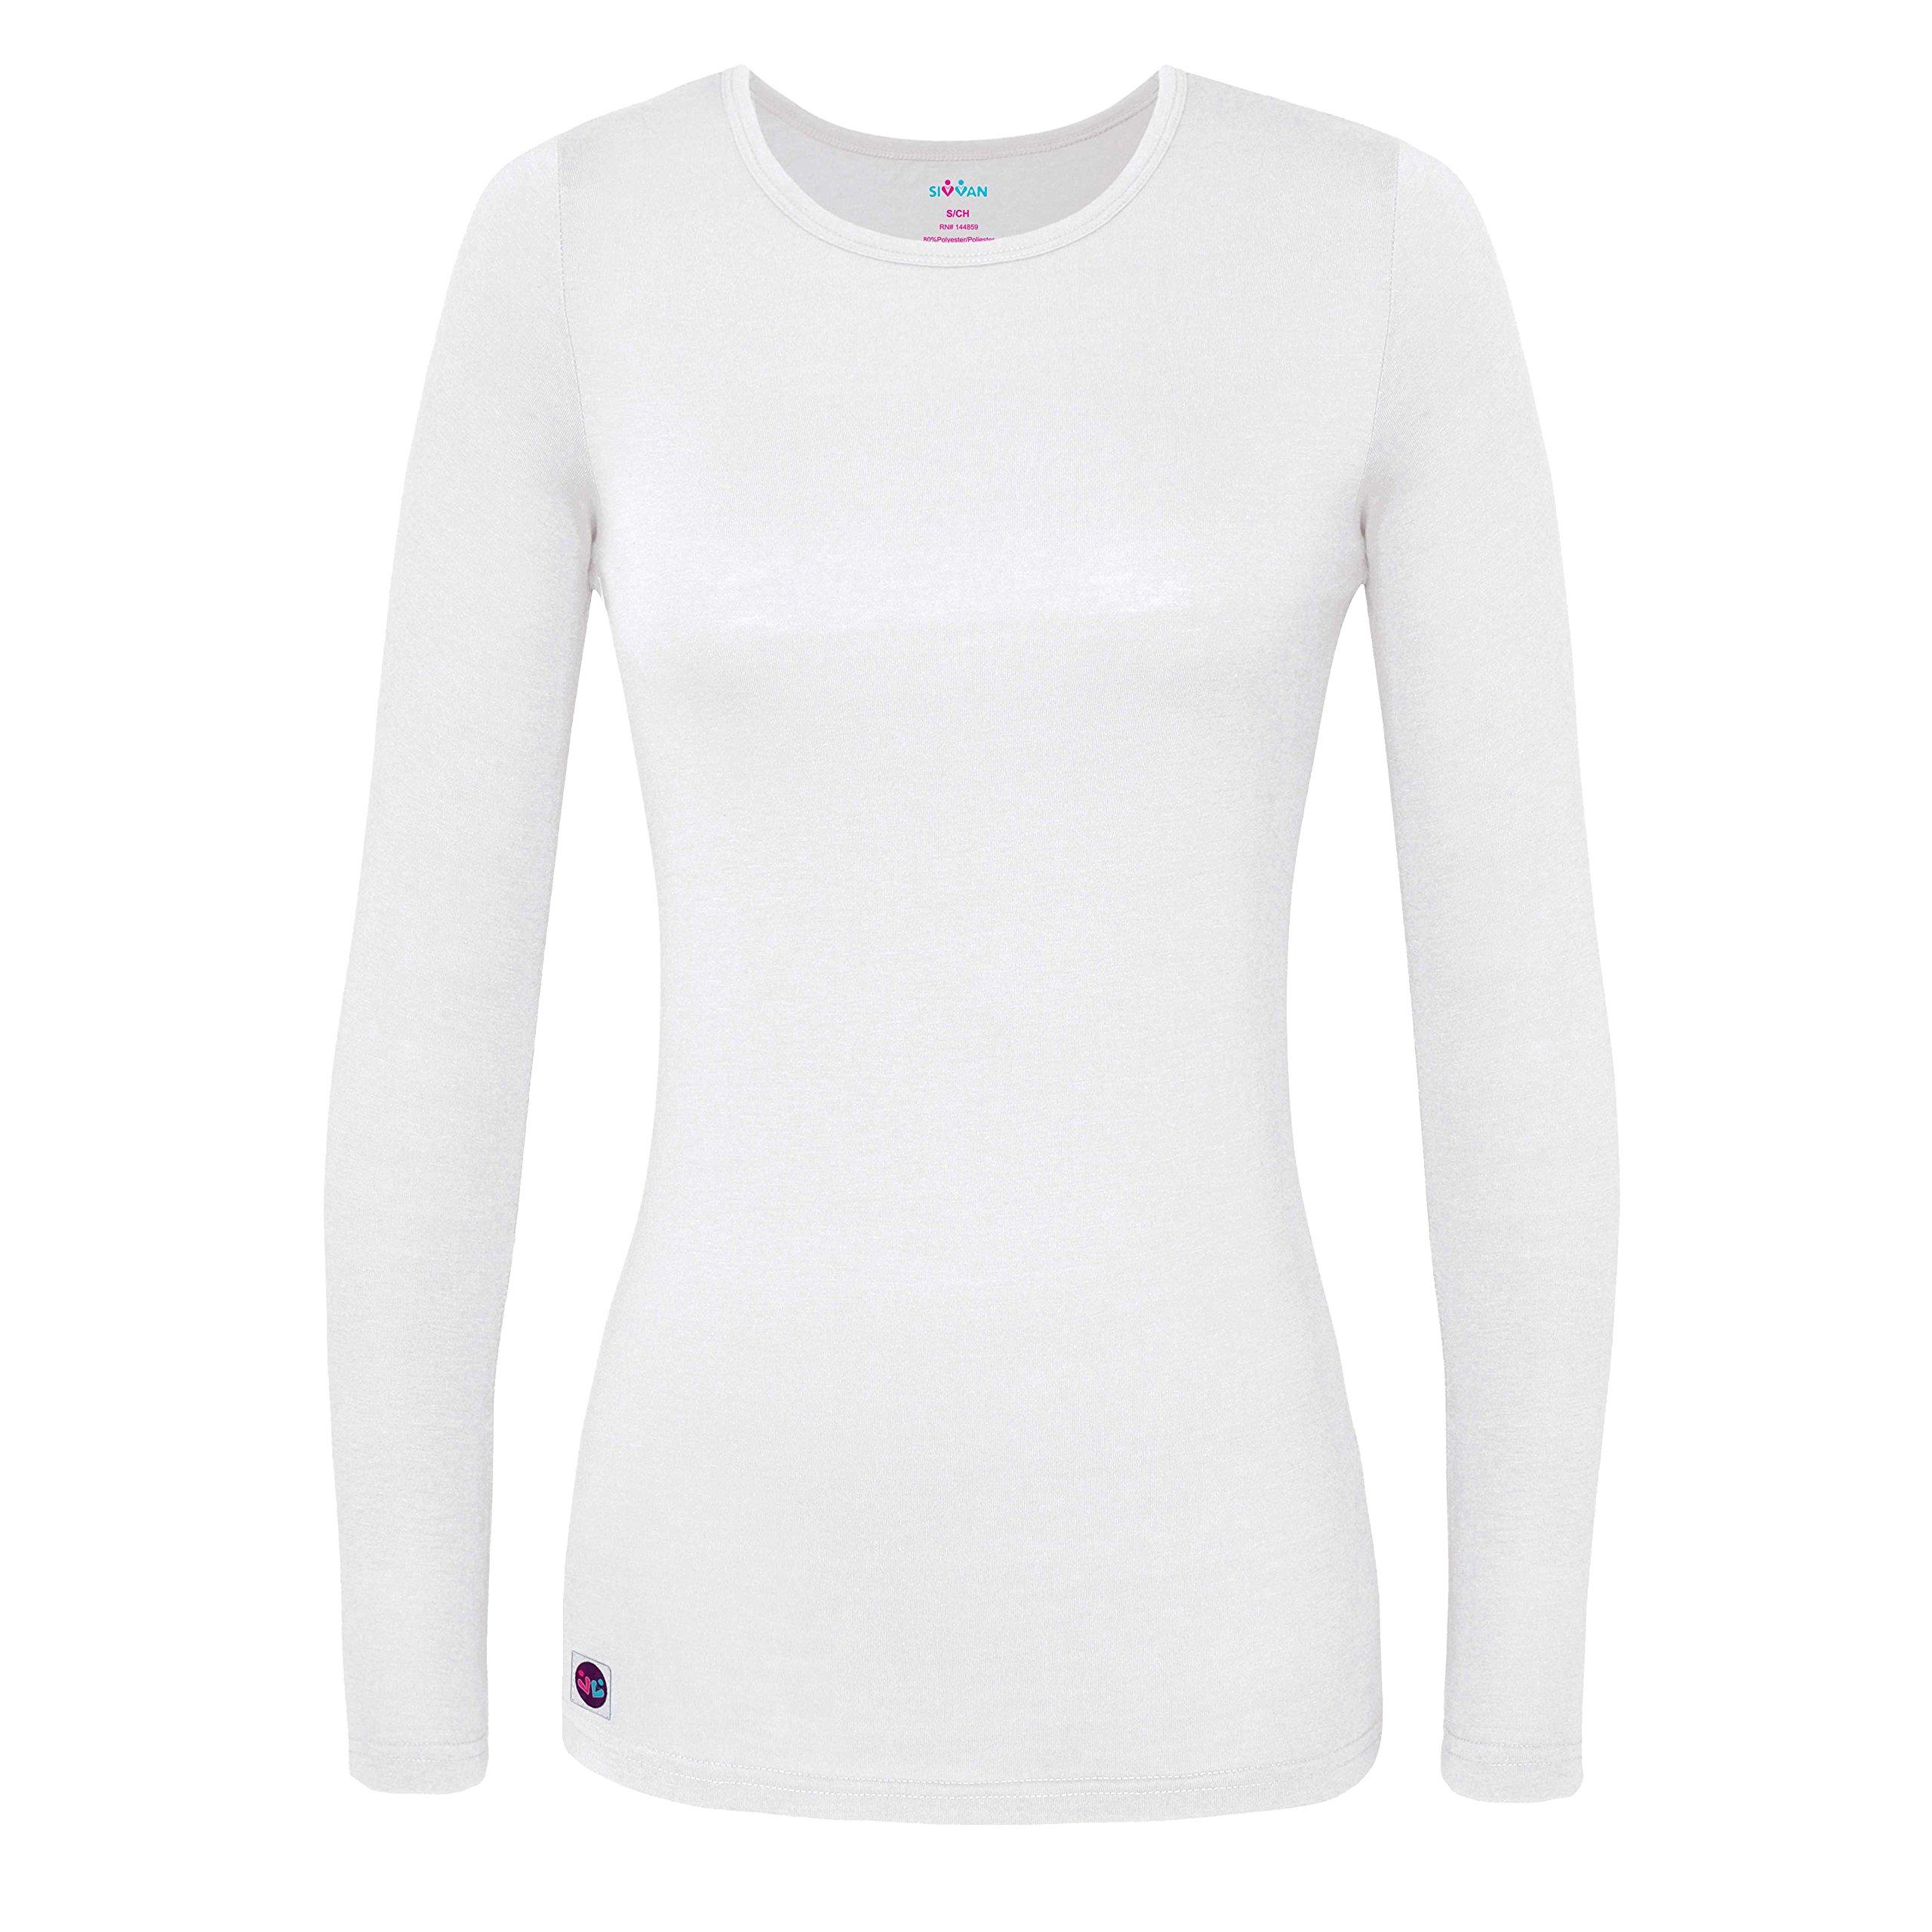 Sivvan Women's Comfort Long Sleeve T-Shirt/Underscrub Tee - S8500 - White - 2X